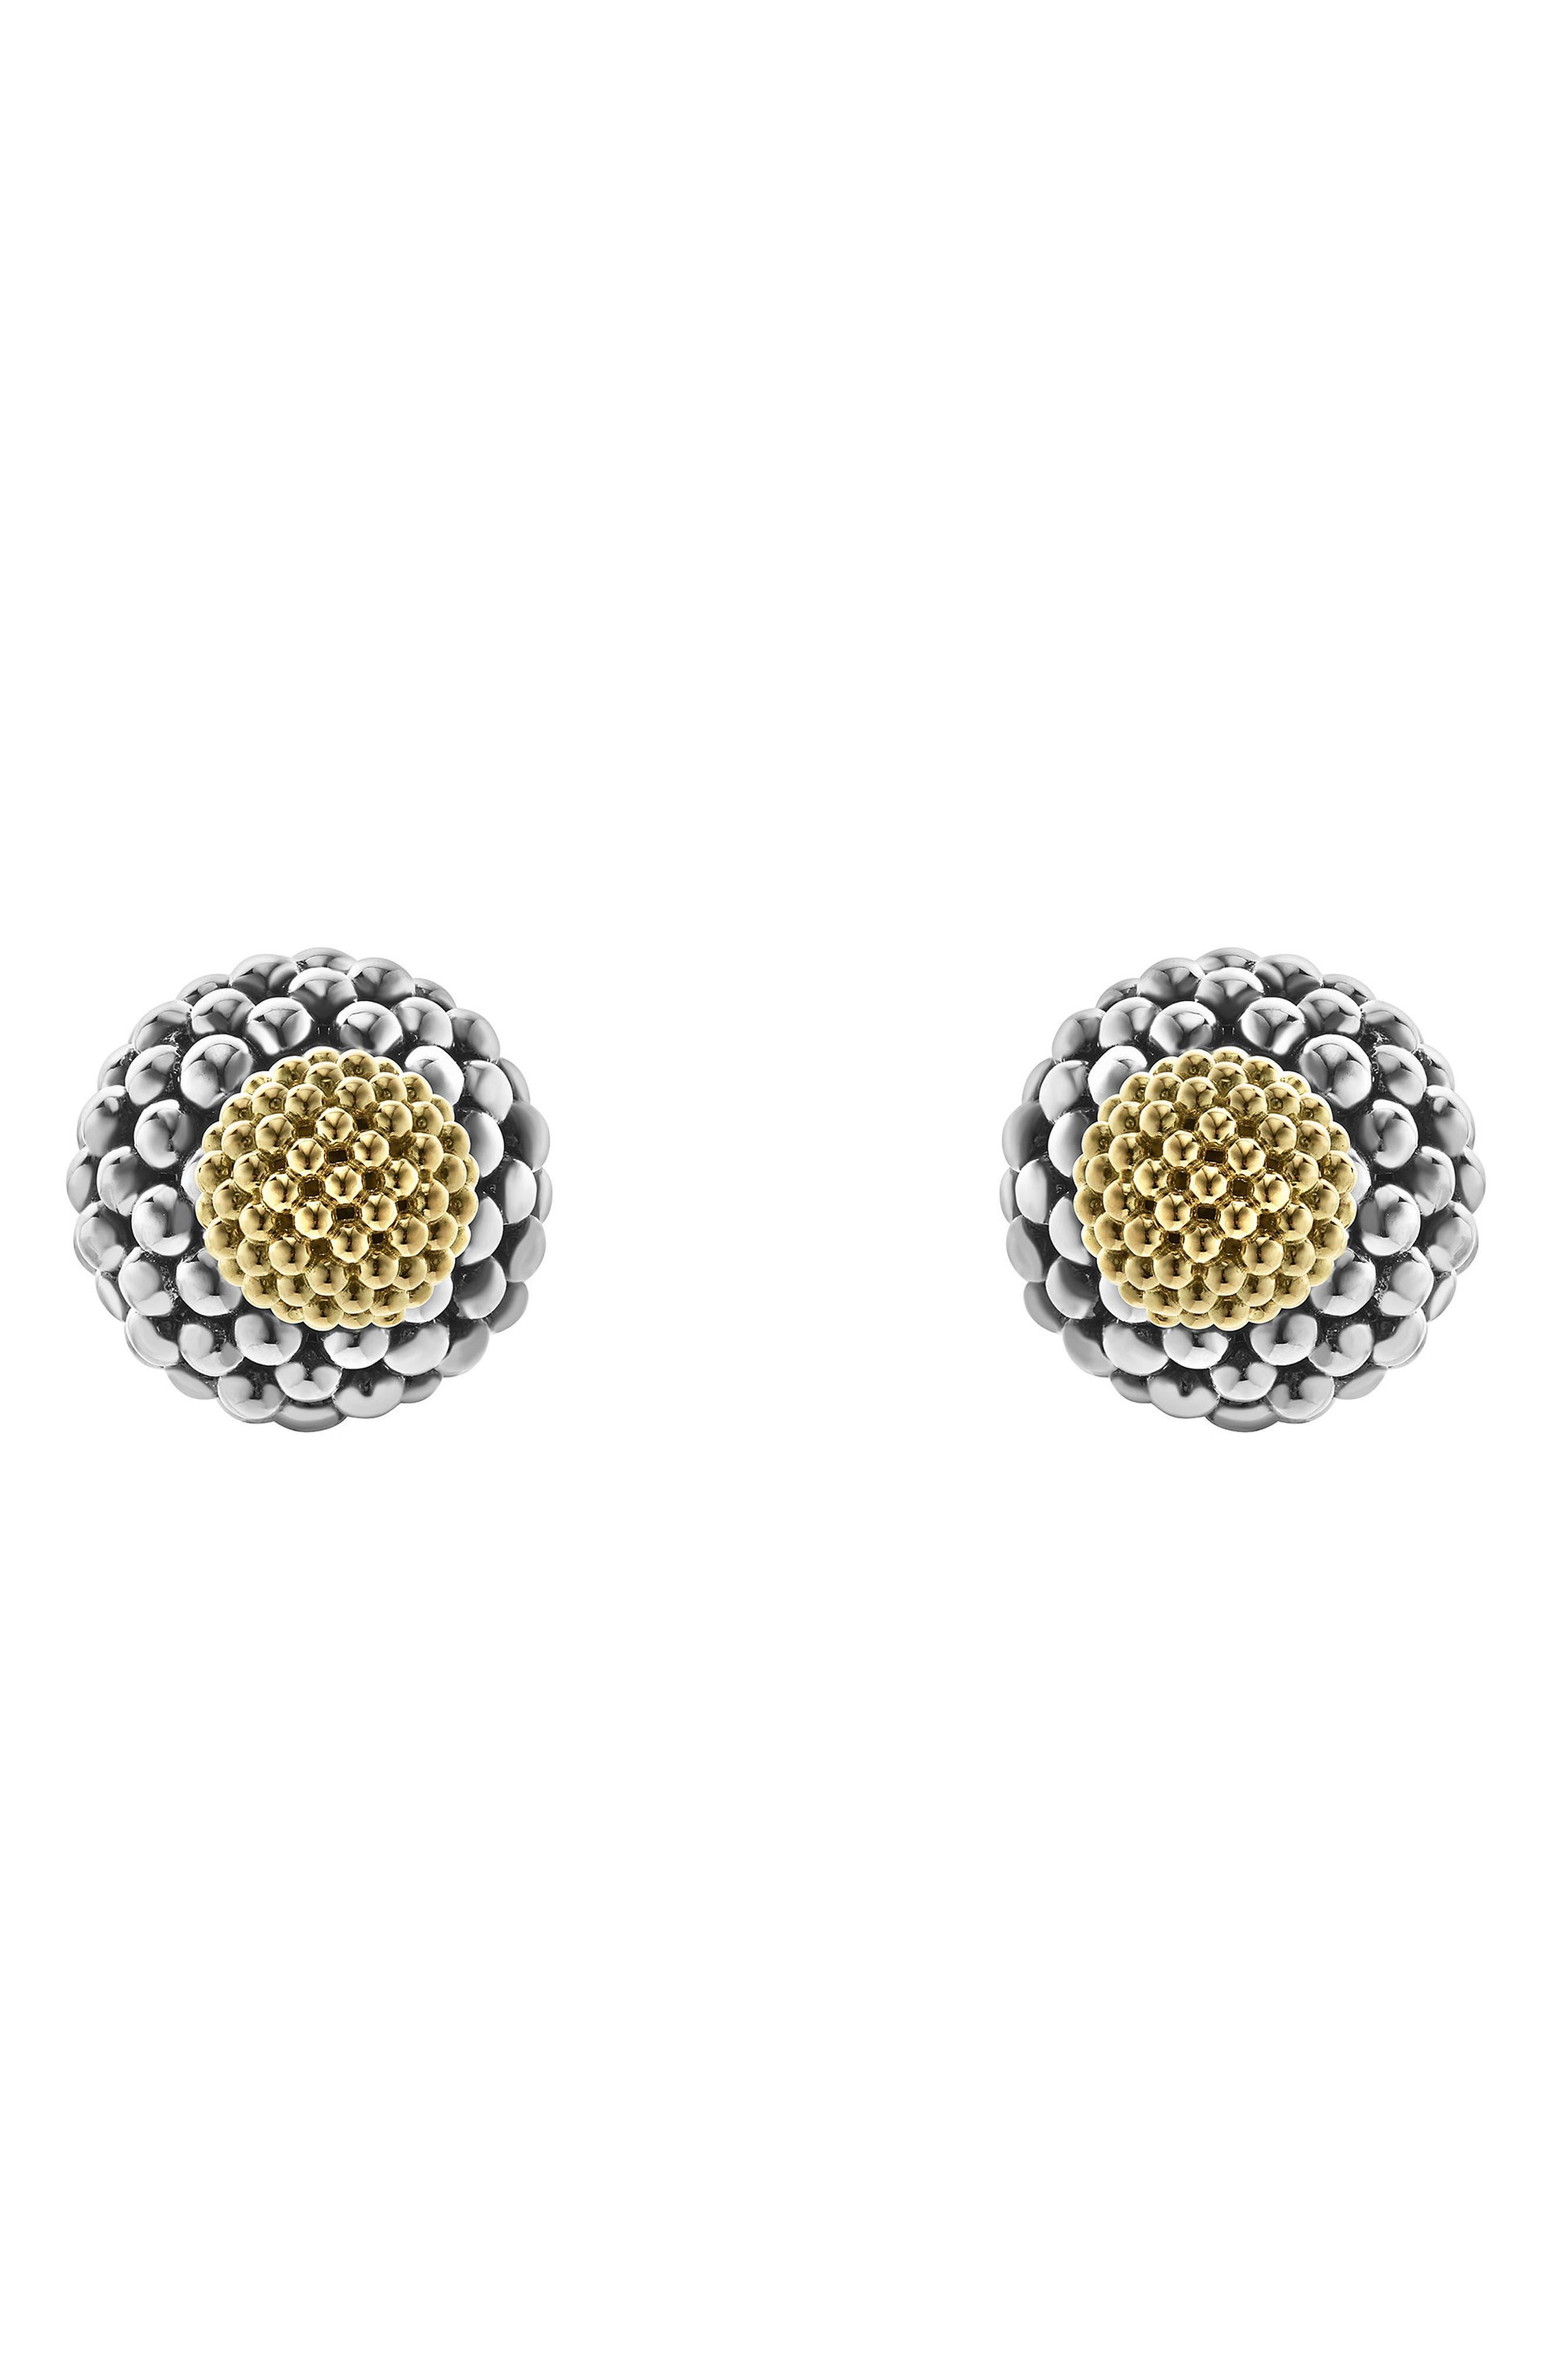 Main Image - LAGOS Caviar Ball Stud Earrings